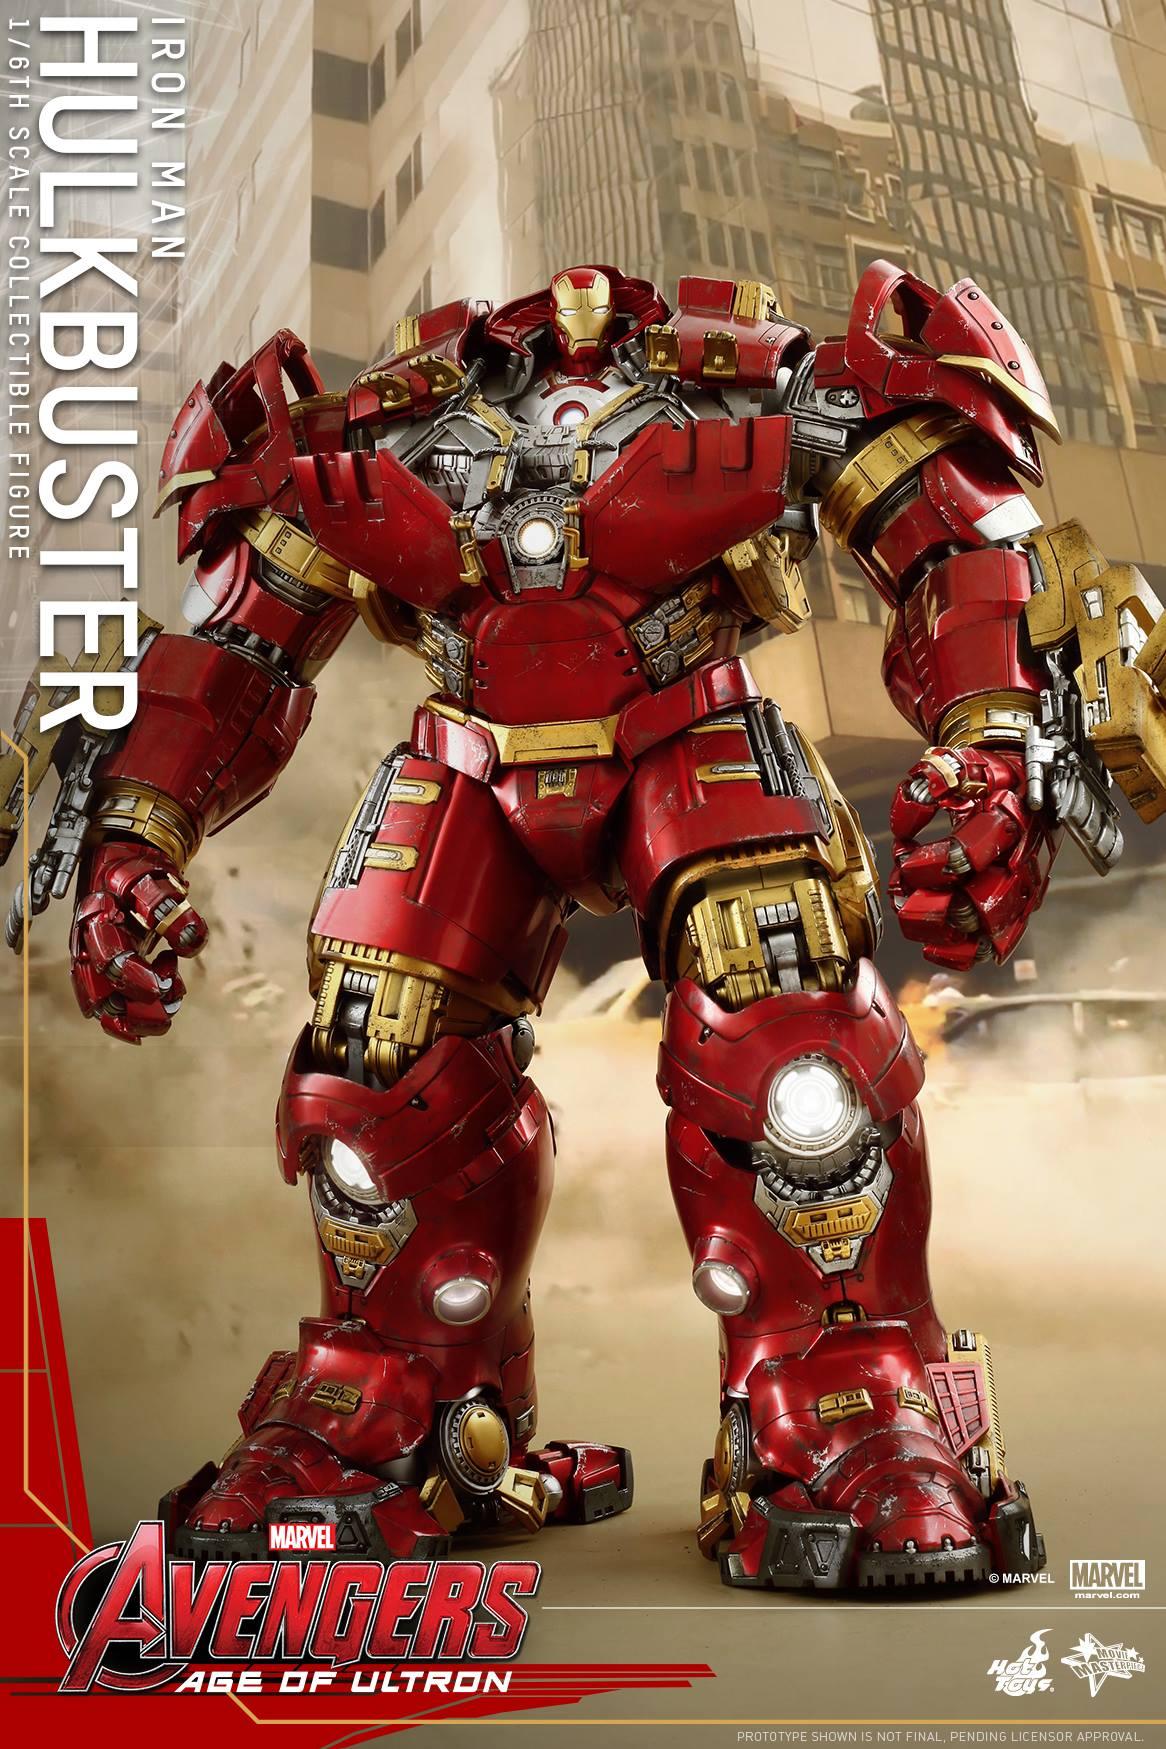 Hot Toys Avengers: Age of Ultron - Hulk and Hulkbuster ...